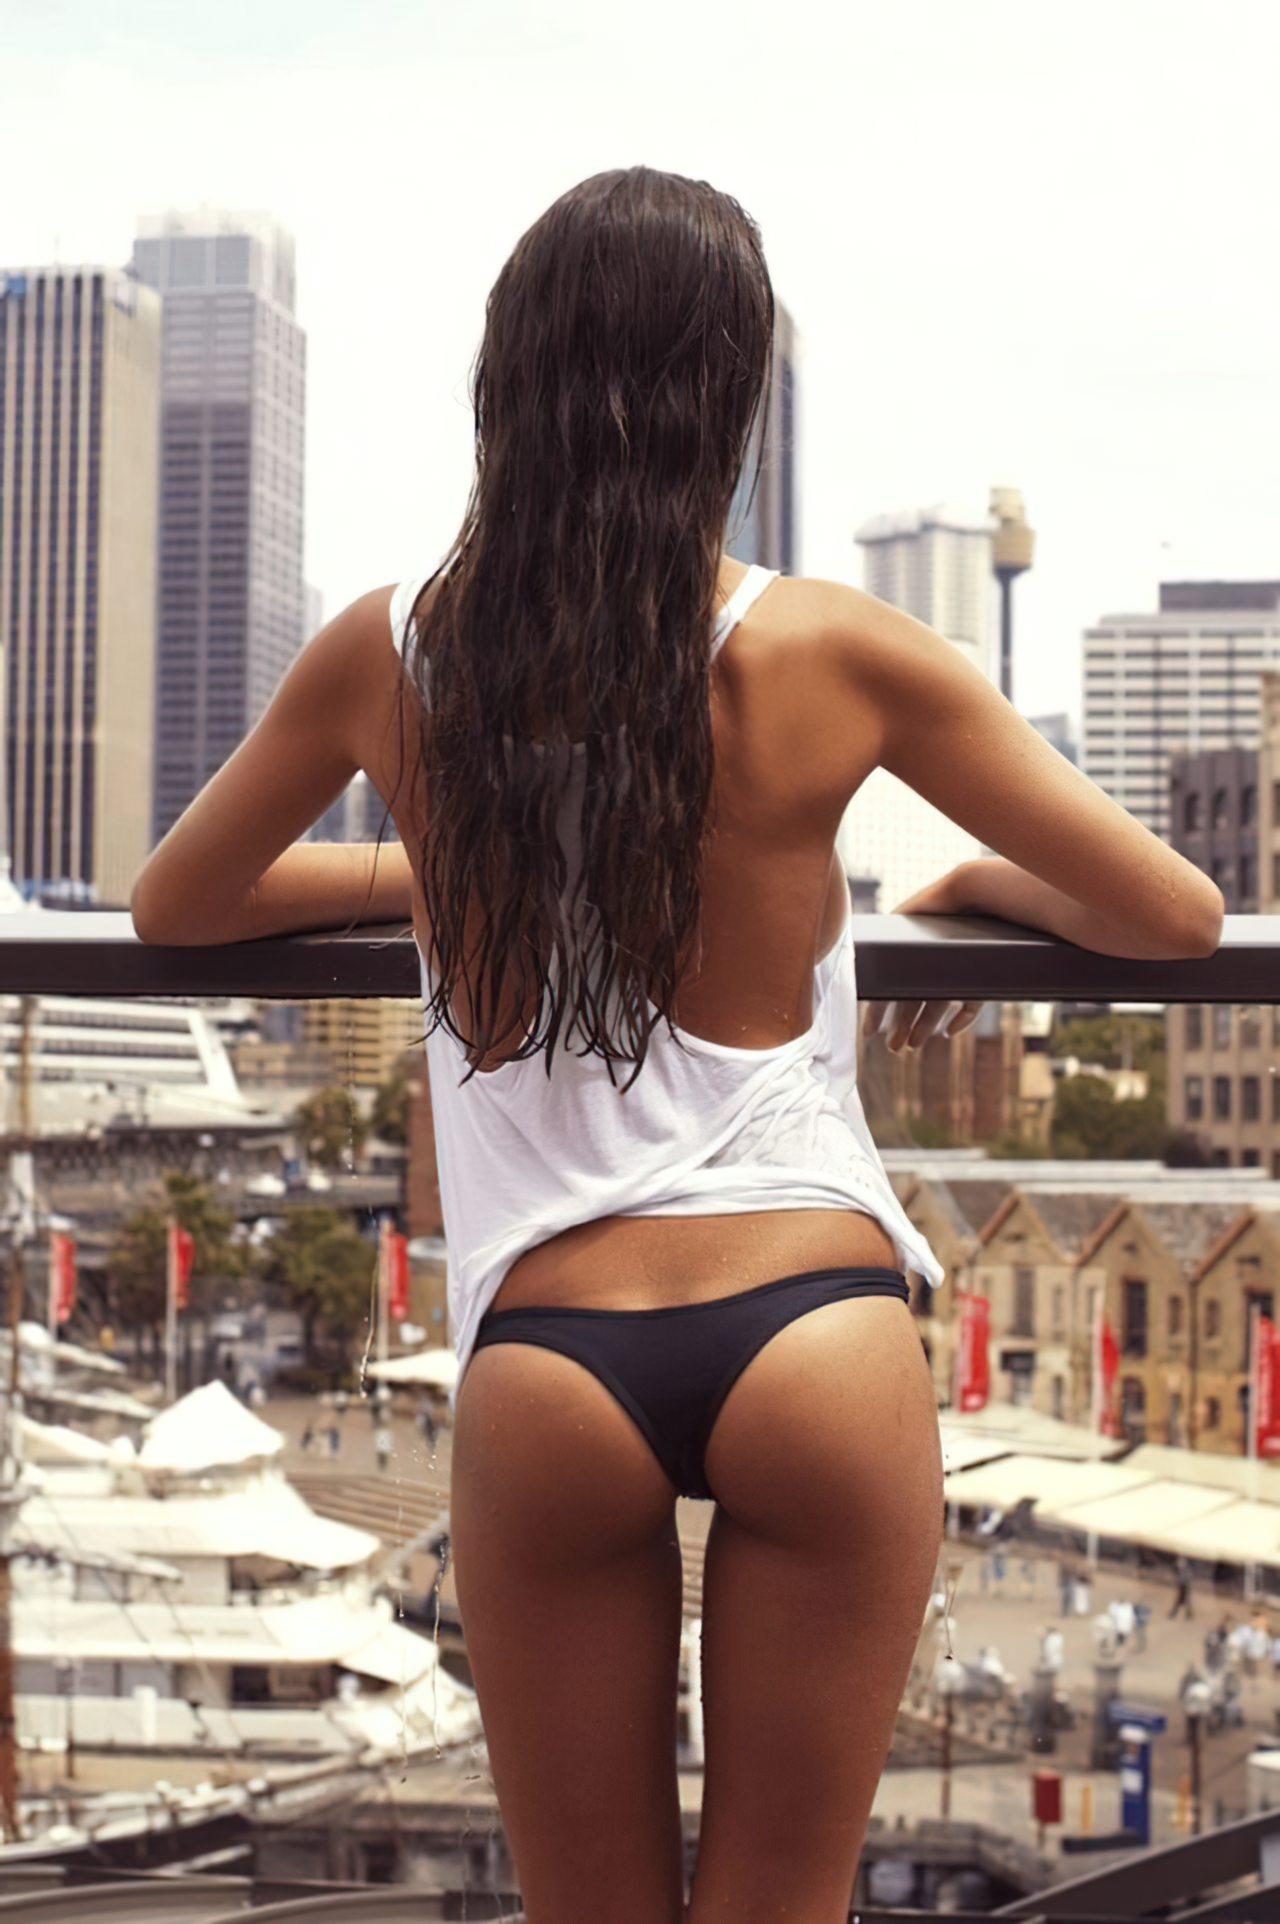 Fotos Mulheres Nuas (31)